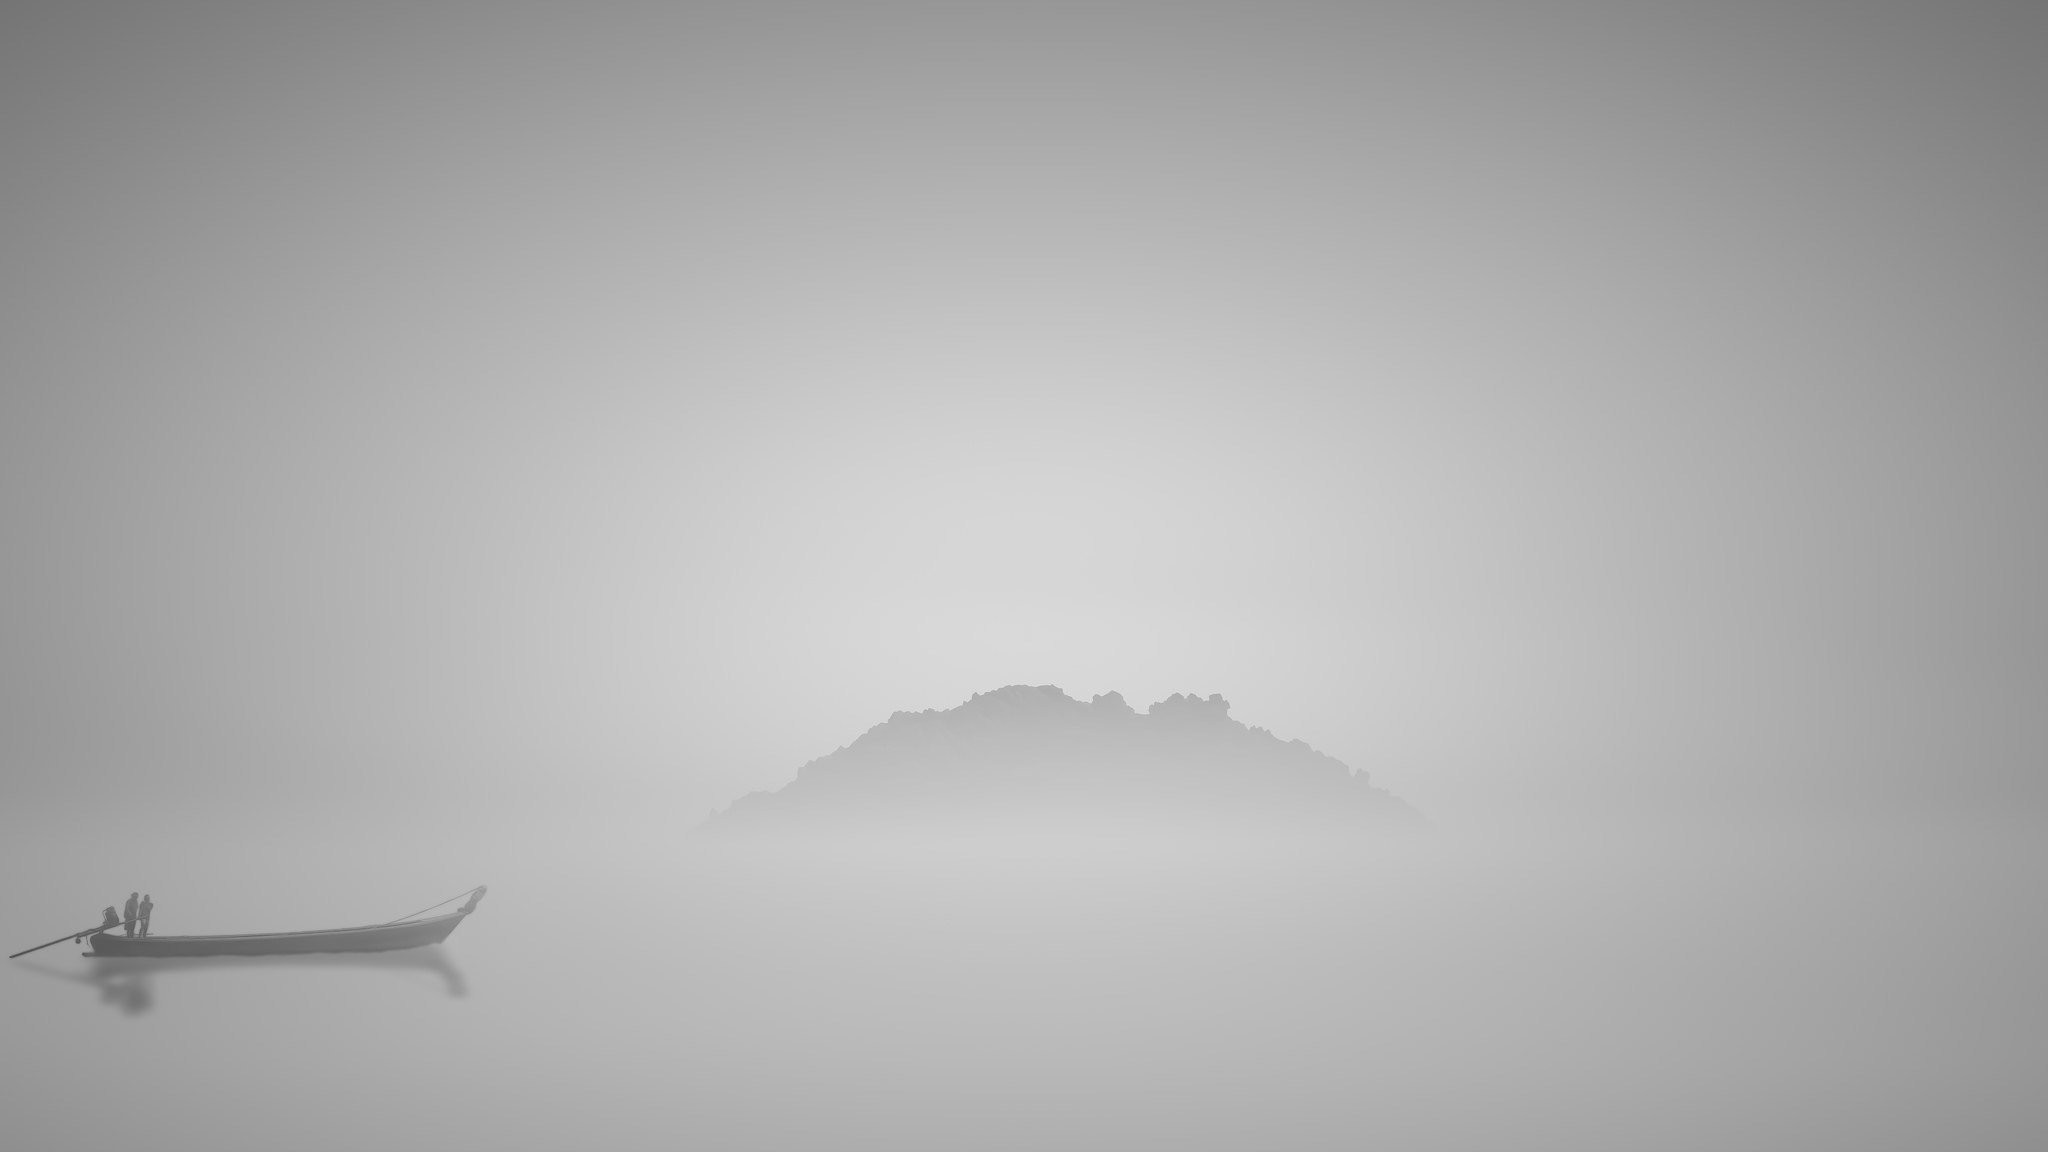 Остров в тумане подборки